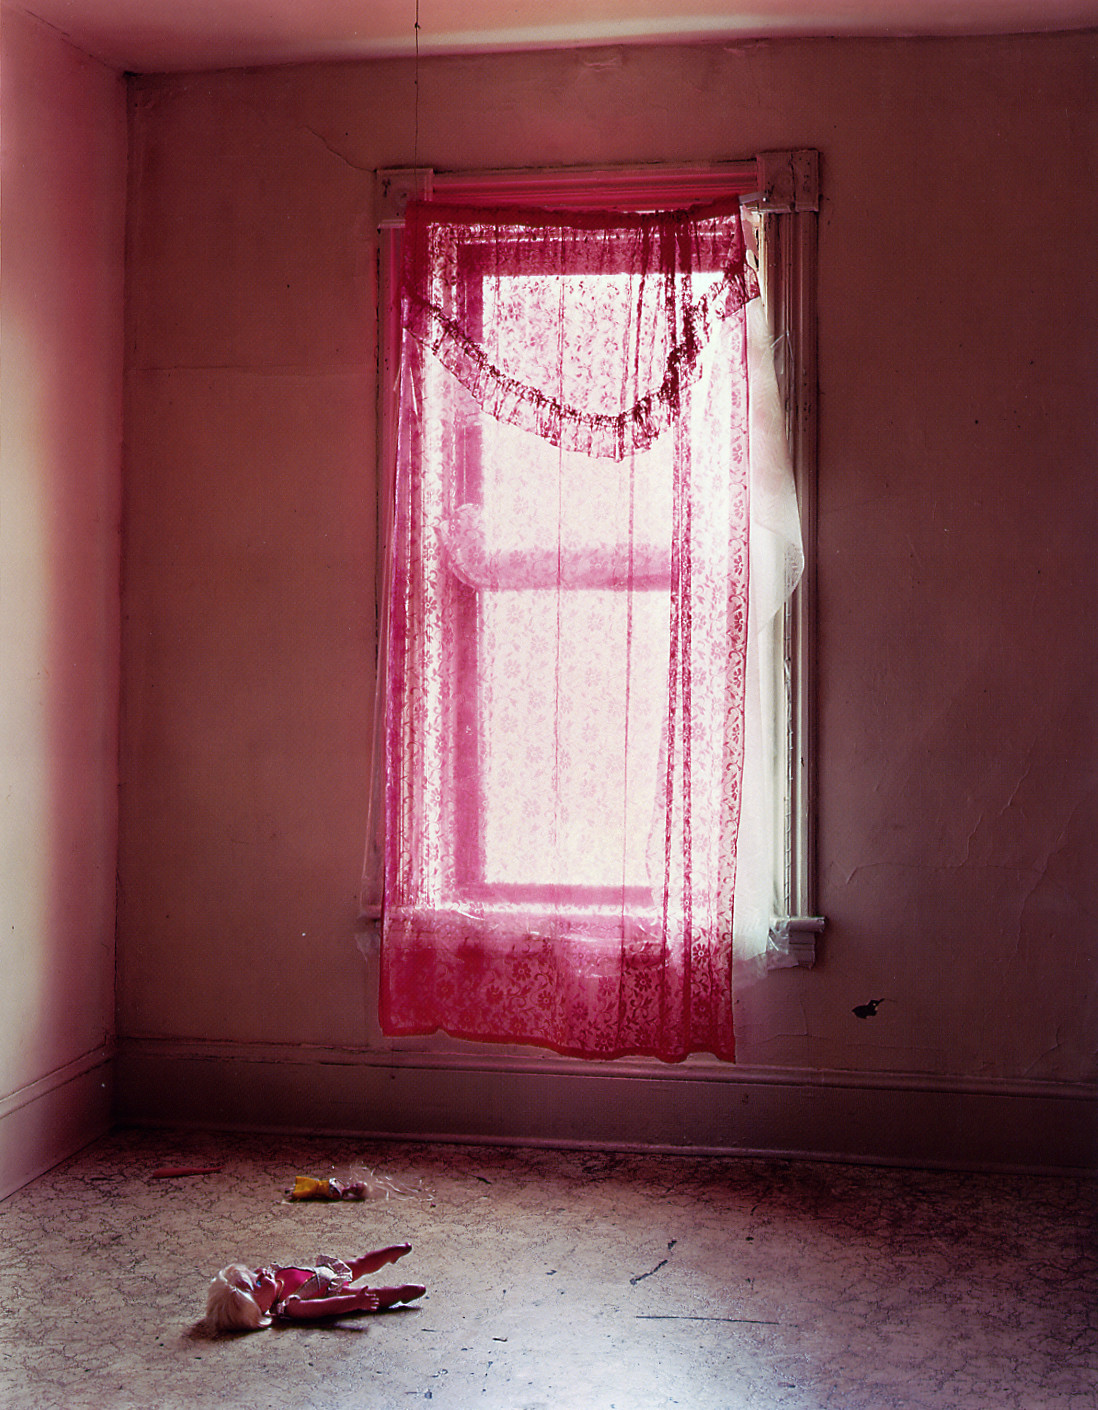 Mitch Epstein, Apartment 201, 398 Main Street, 2001